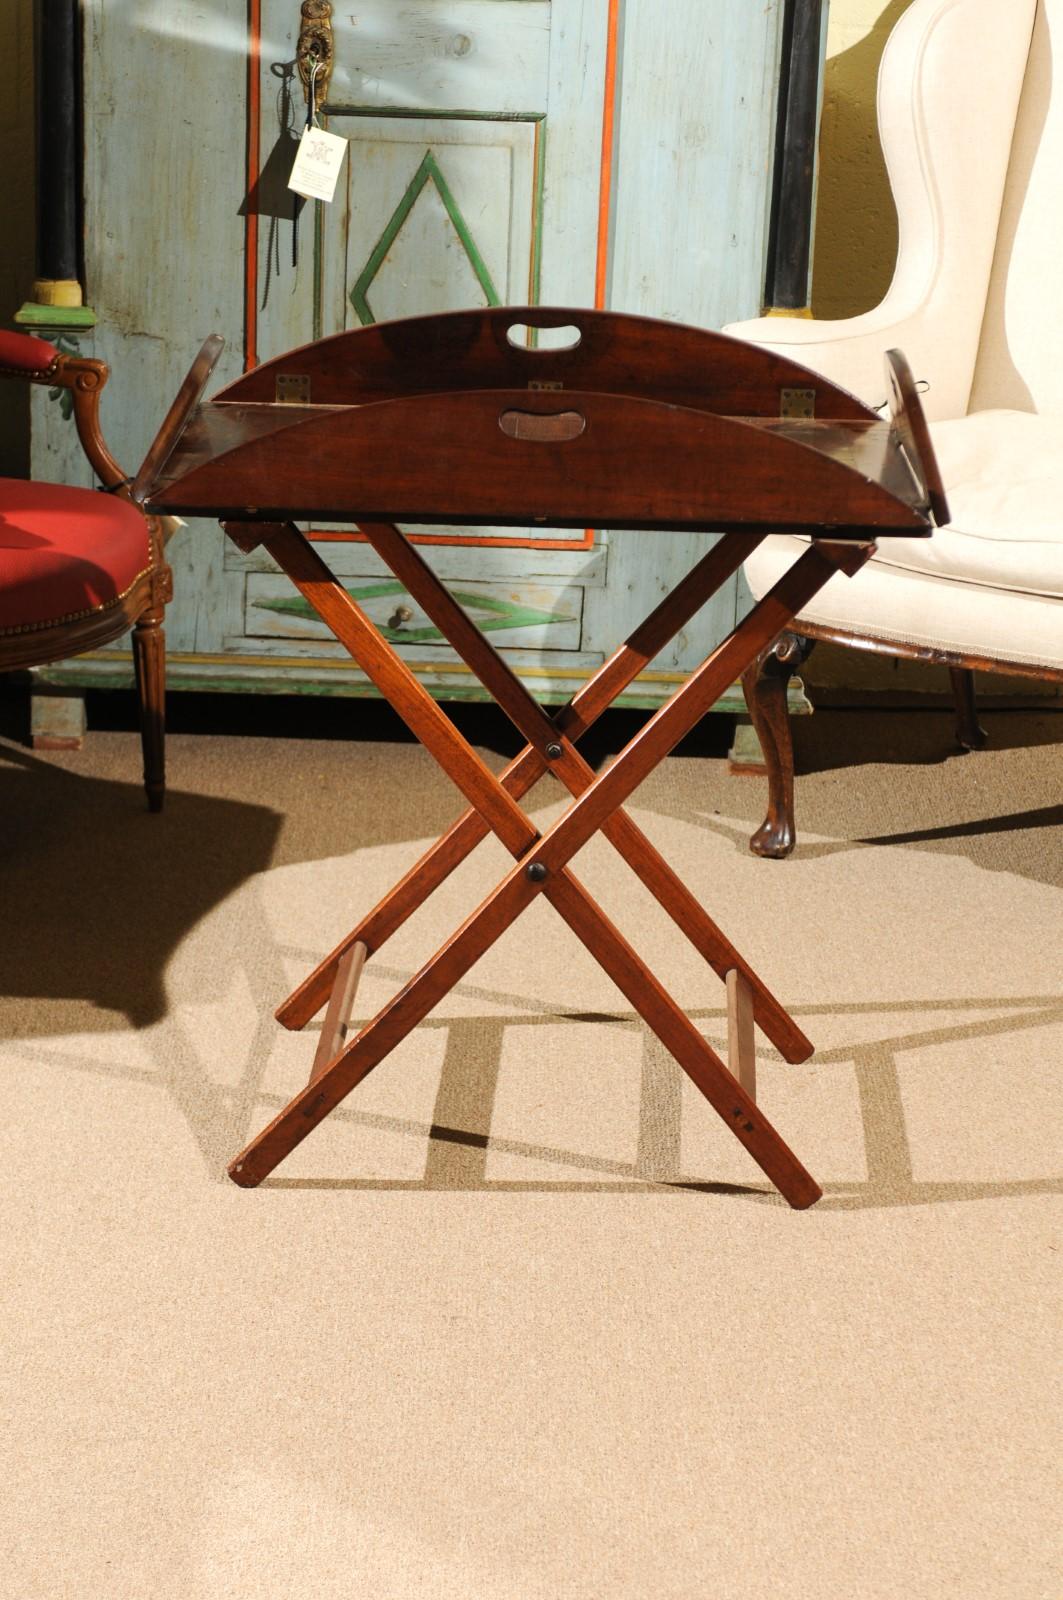 English Mahogany Butler's Tray on Folding Stand, 19th ... on Corner Sconce Shelf Tray id=31873